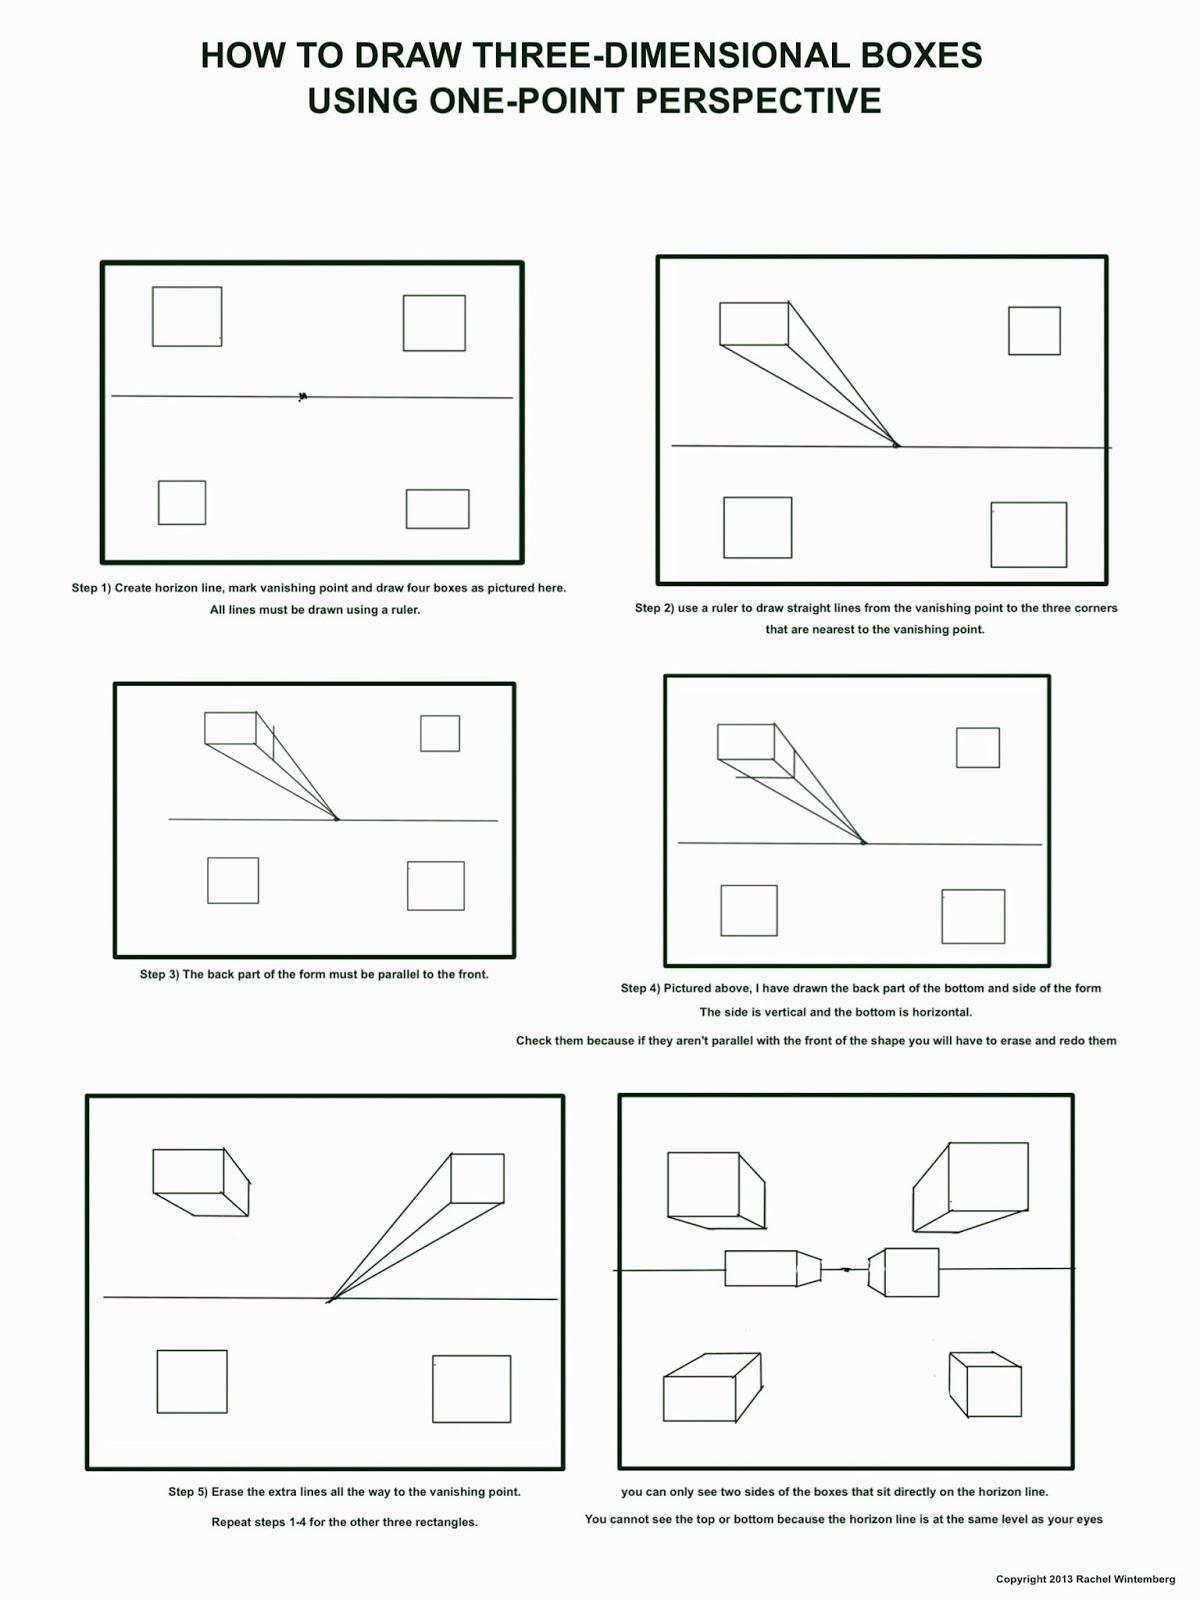 How To Draw Shadow Diagrams Mansfield Flush Valve Diagram The Helpful Art Teacher A Geometric Still Life By